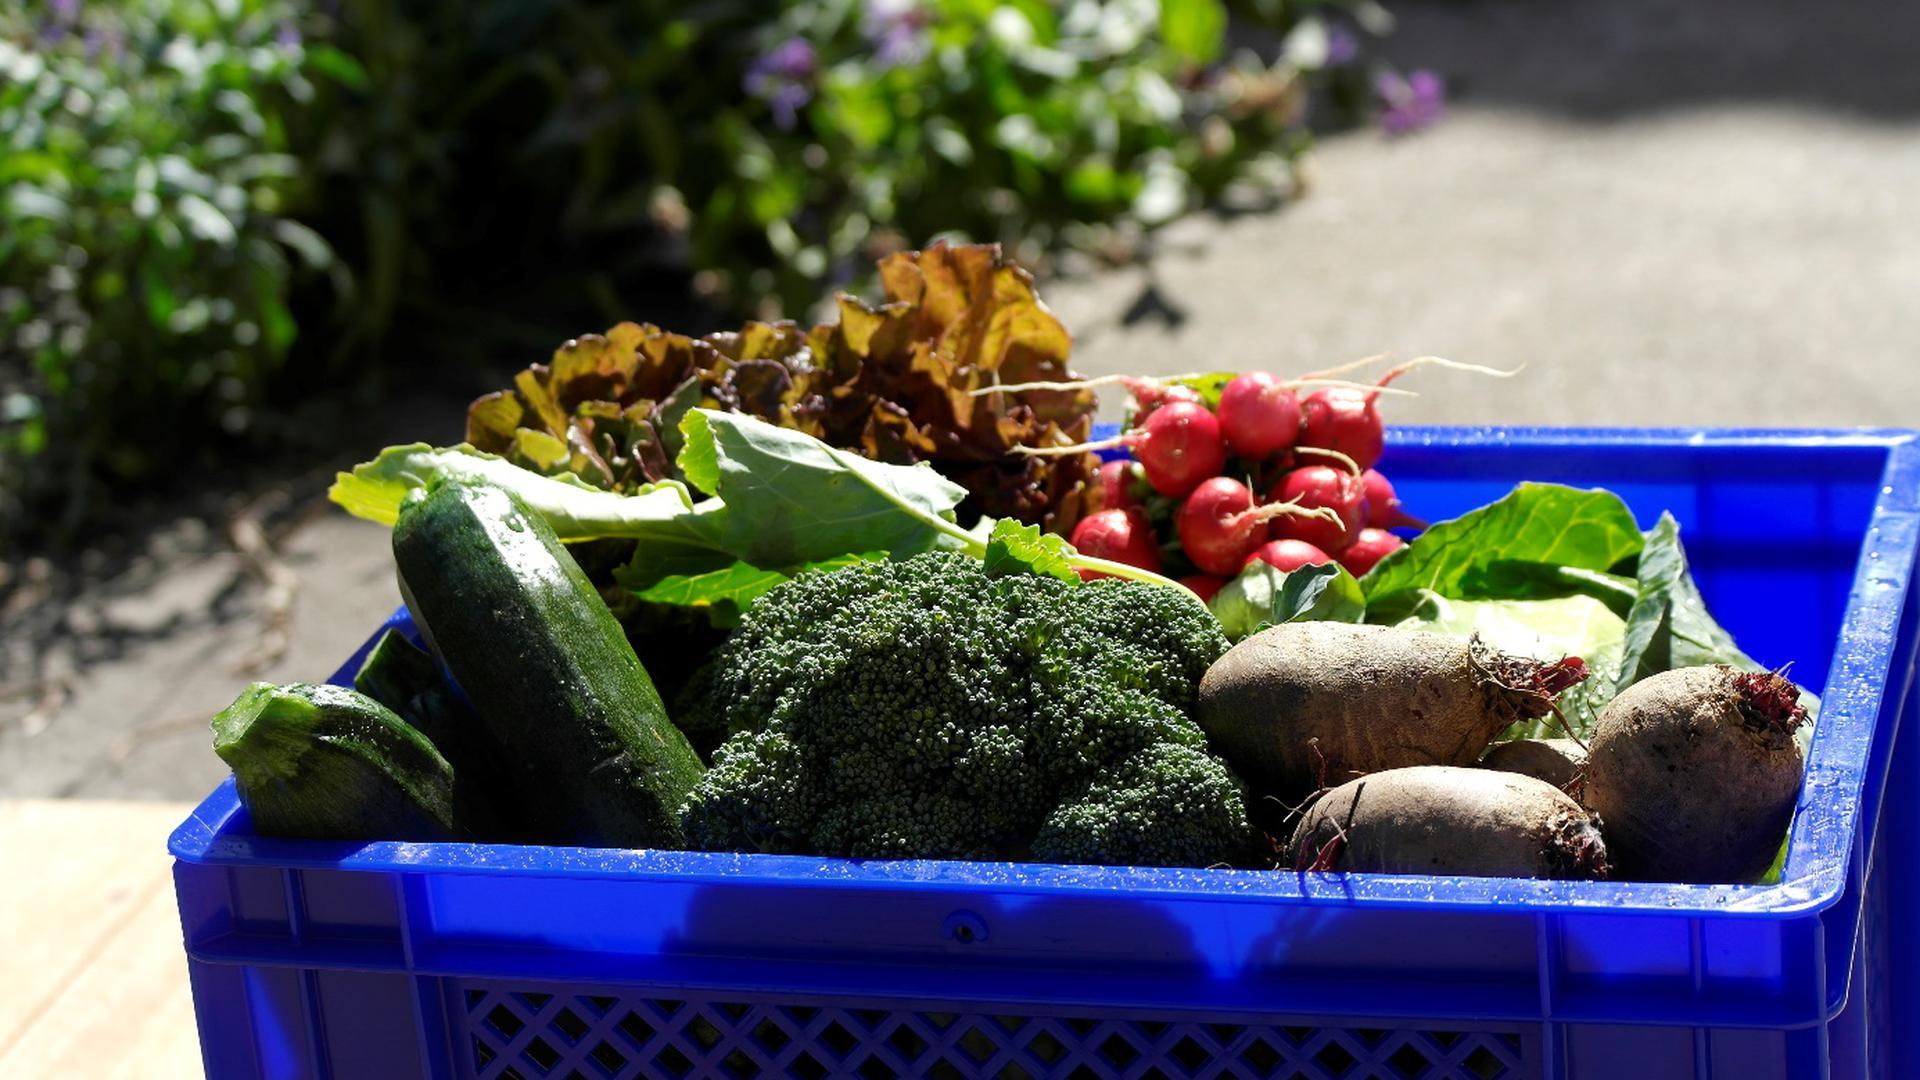 Gemüsekiste gefüllt